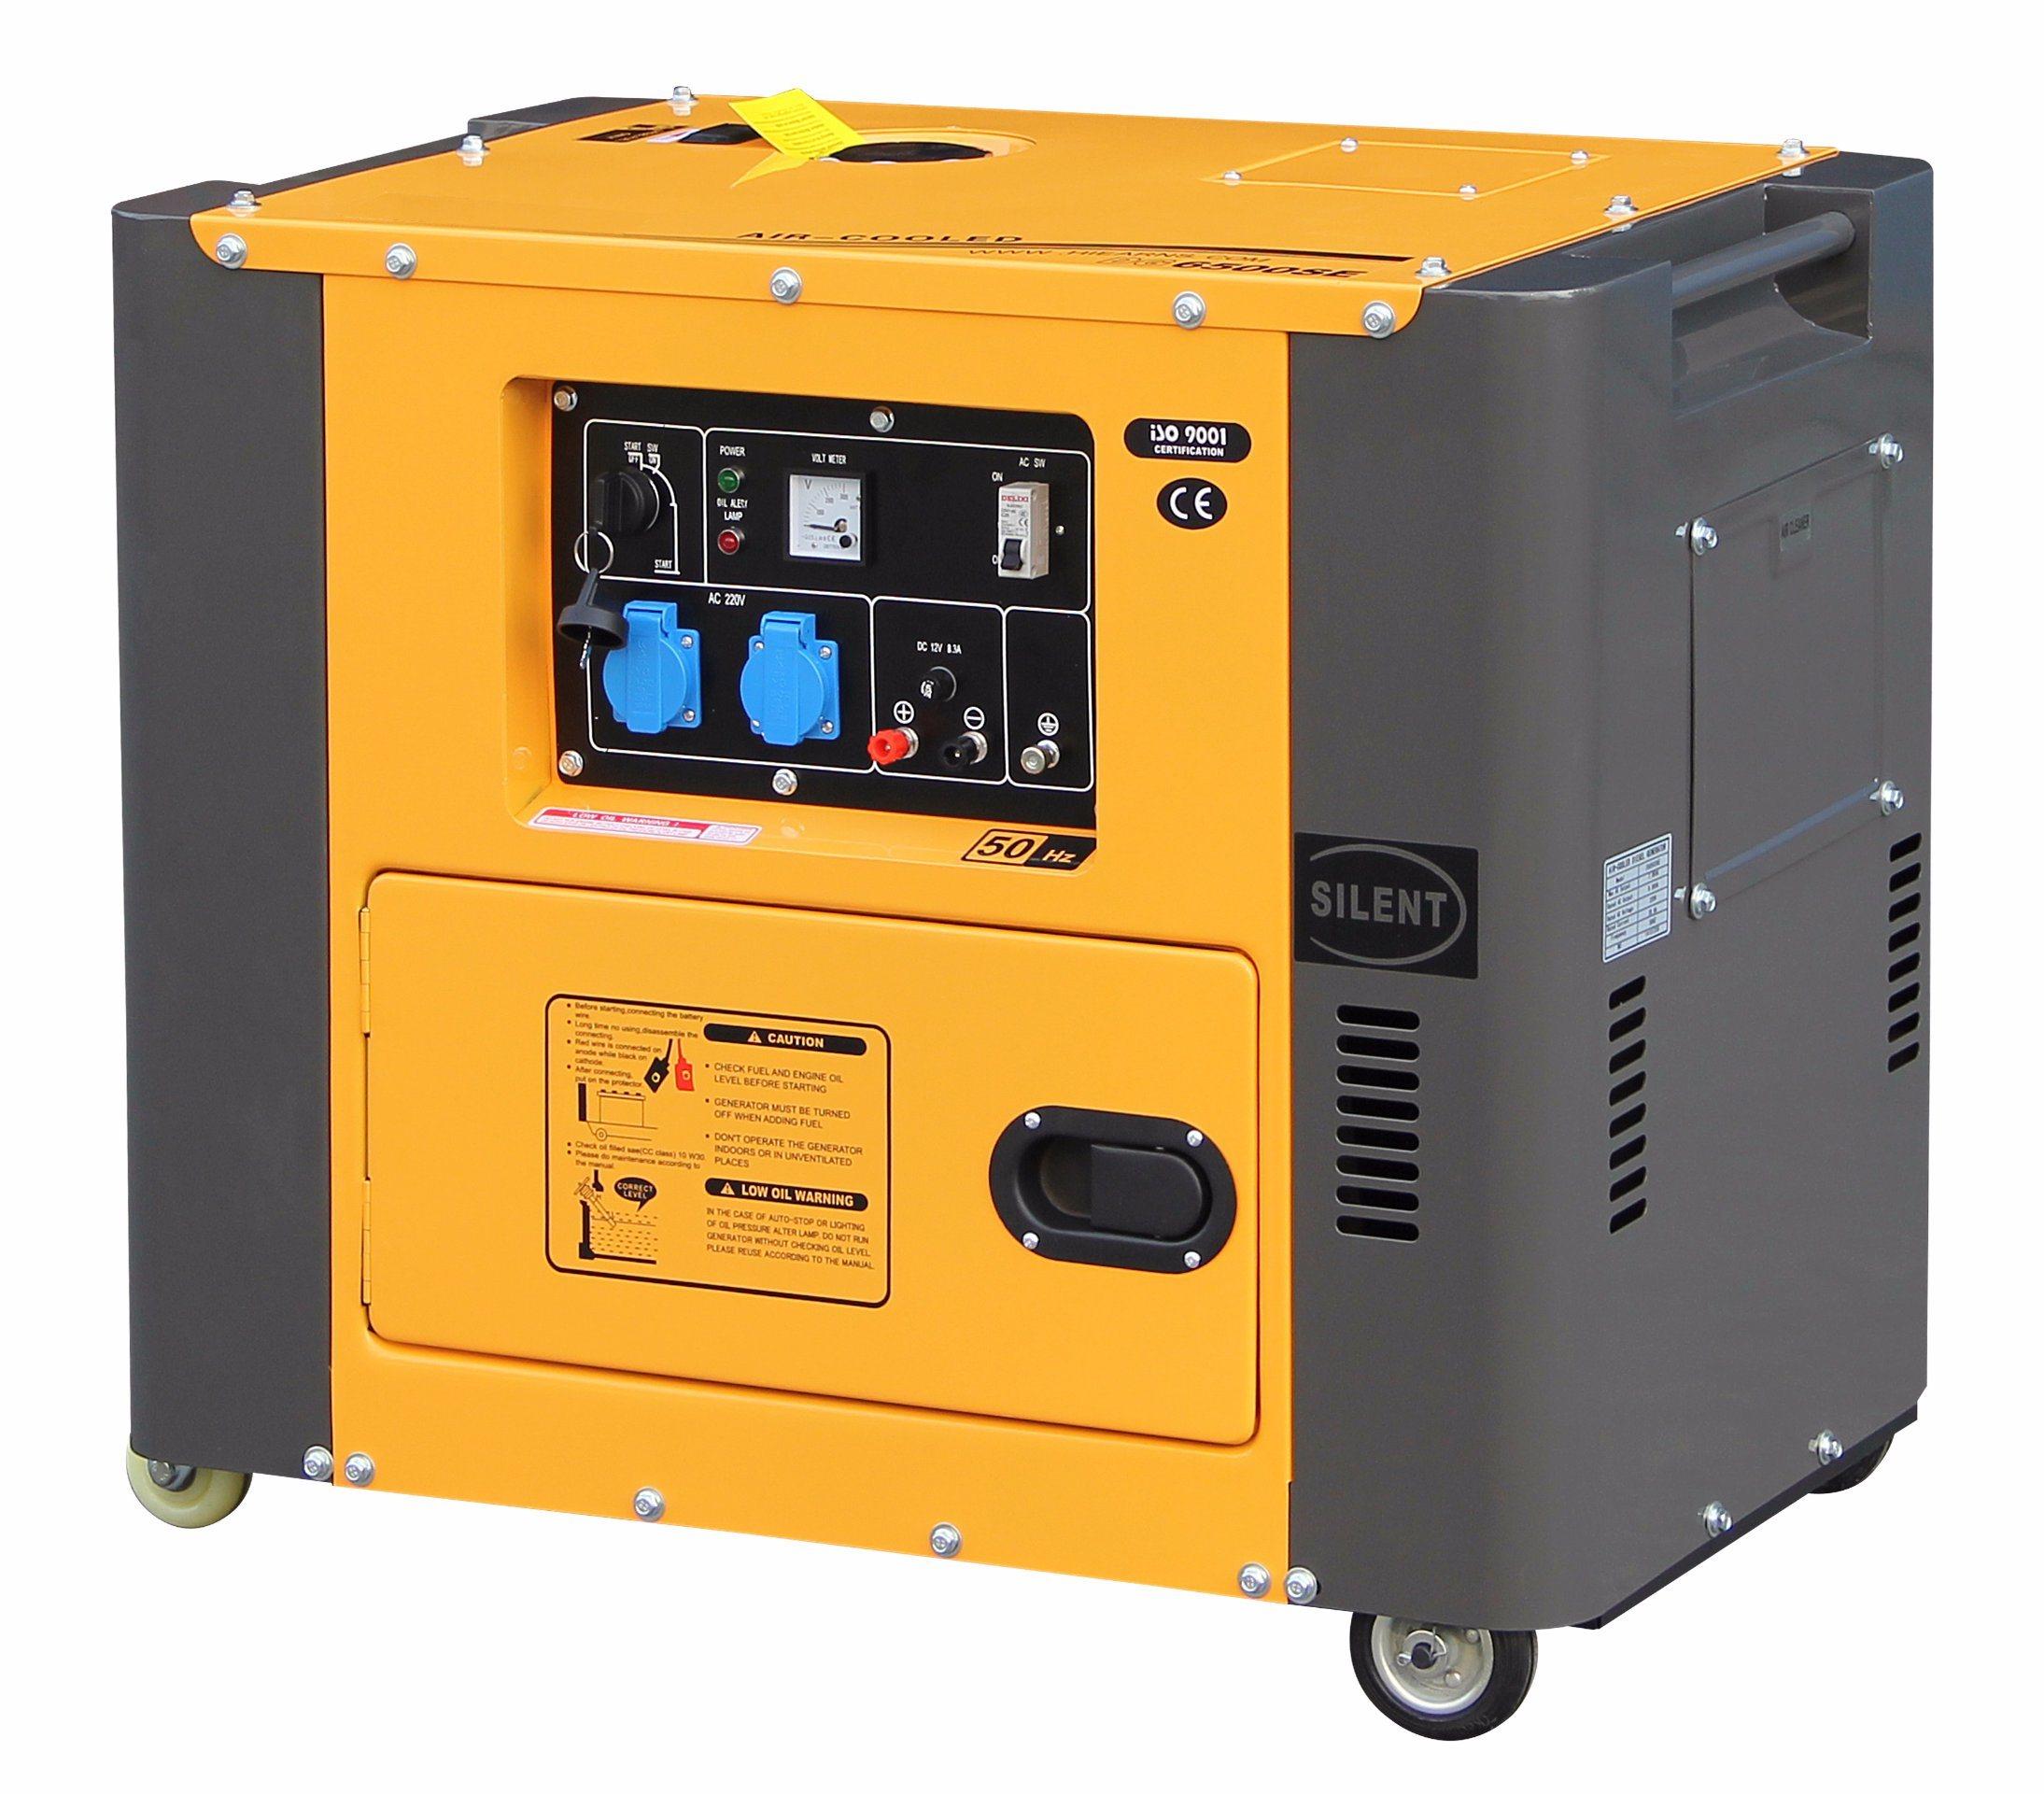 5kw Portable Air-Cooled Silent Diesel Generator